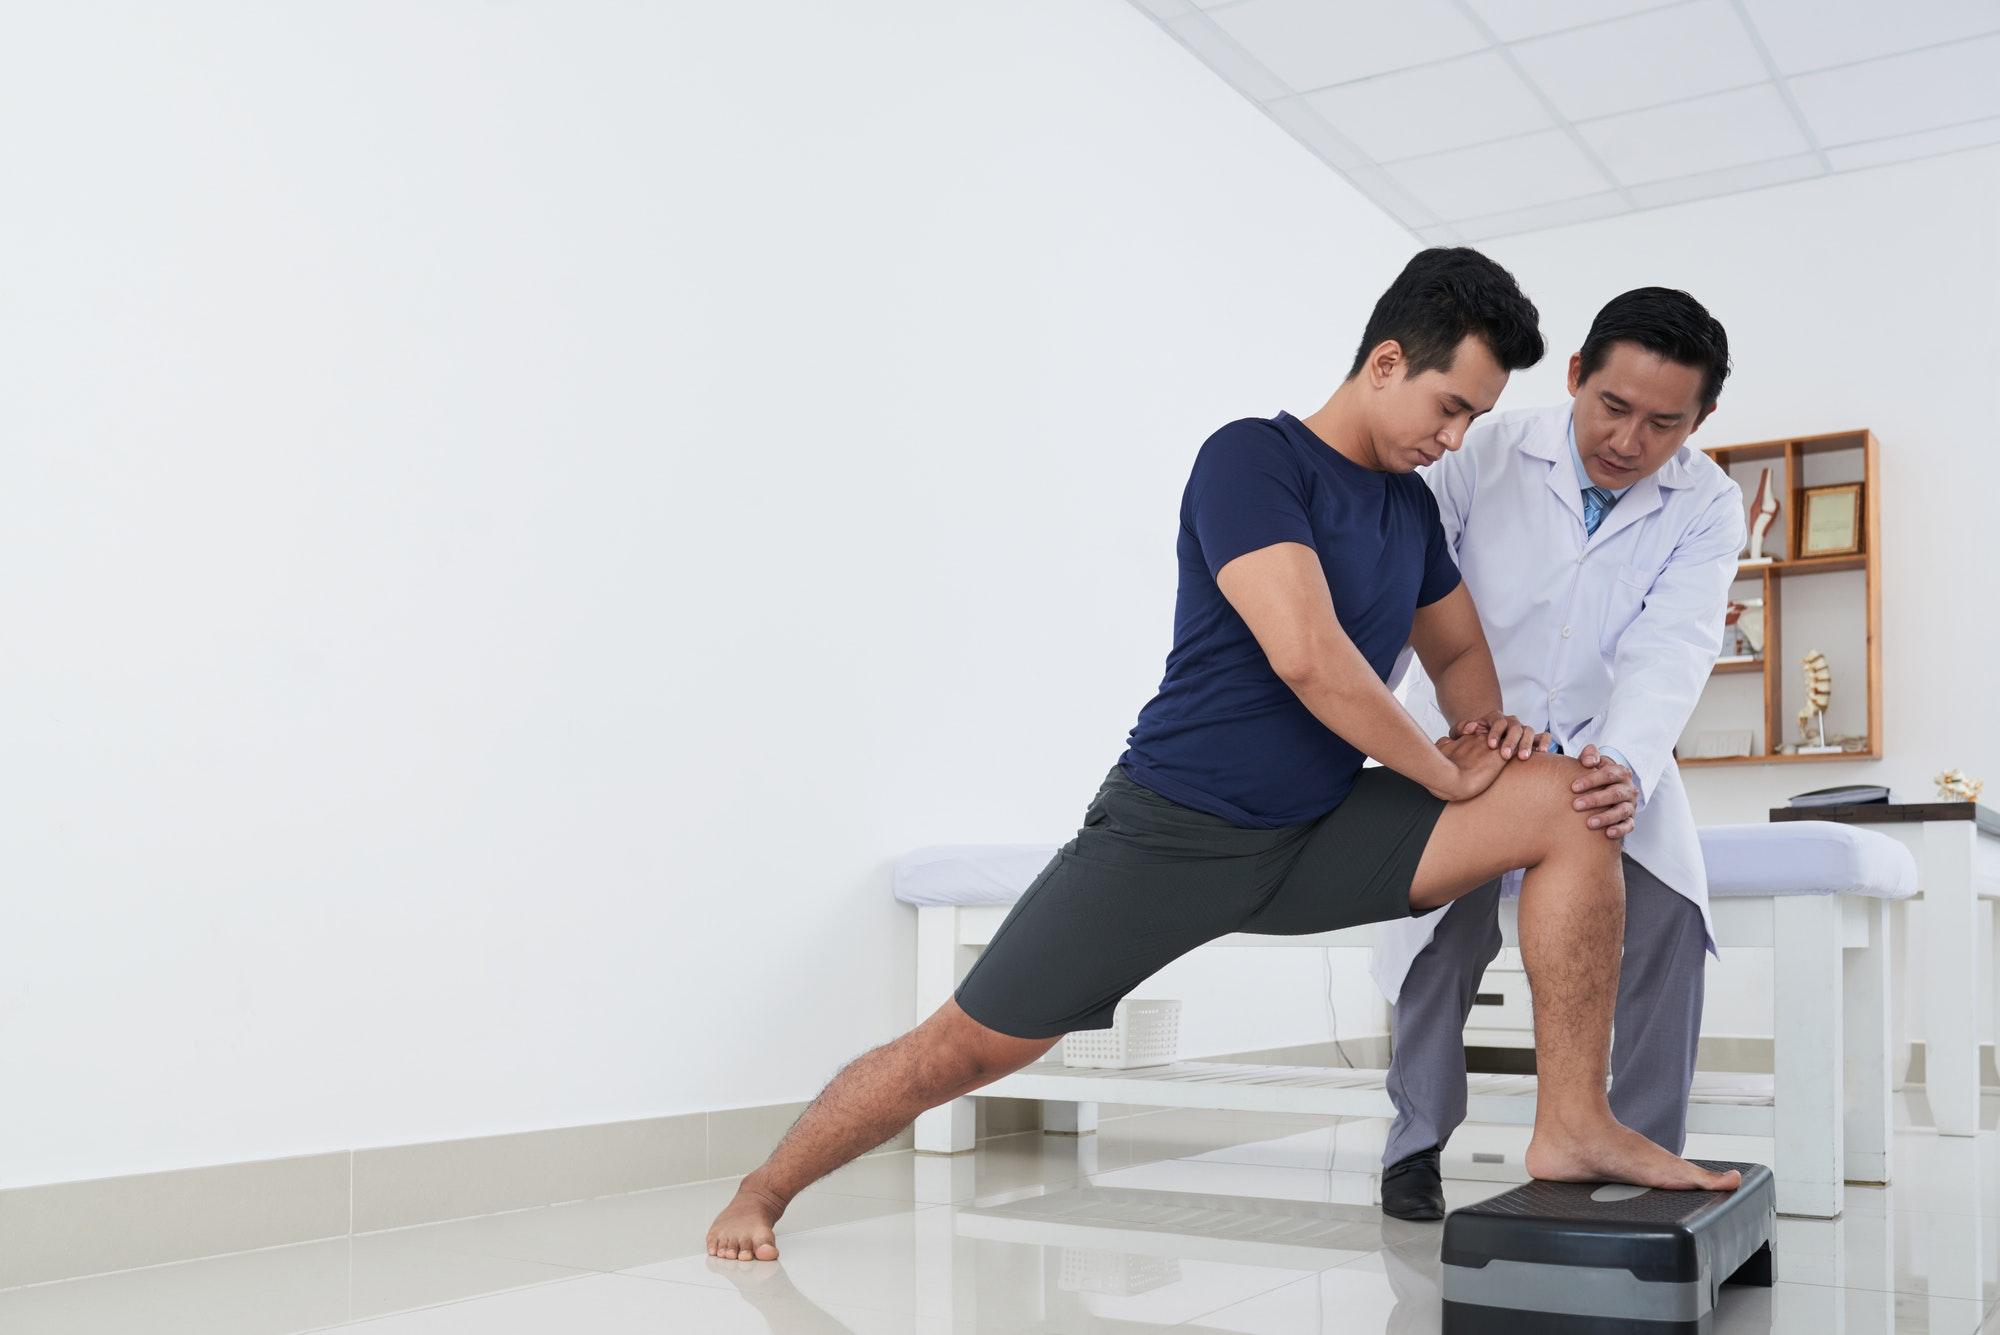 At physiotherapist